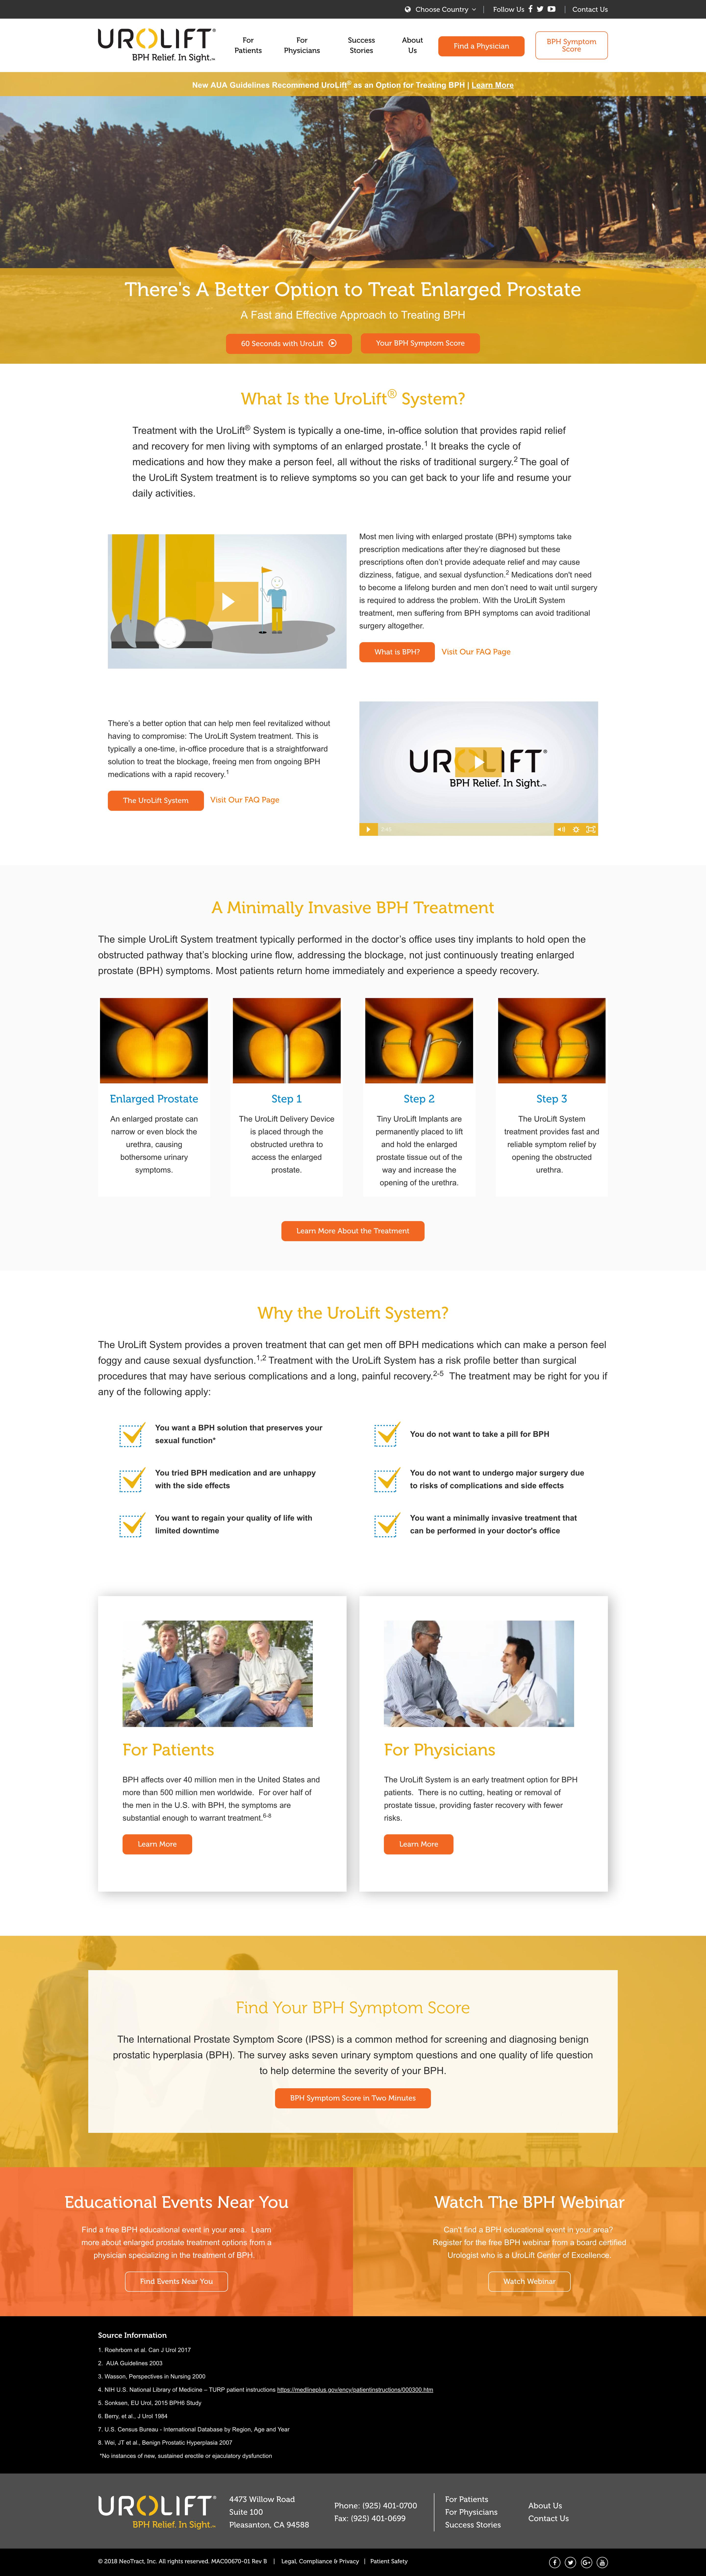 UroLift Homepage